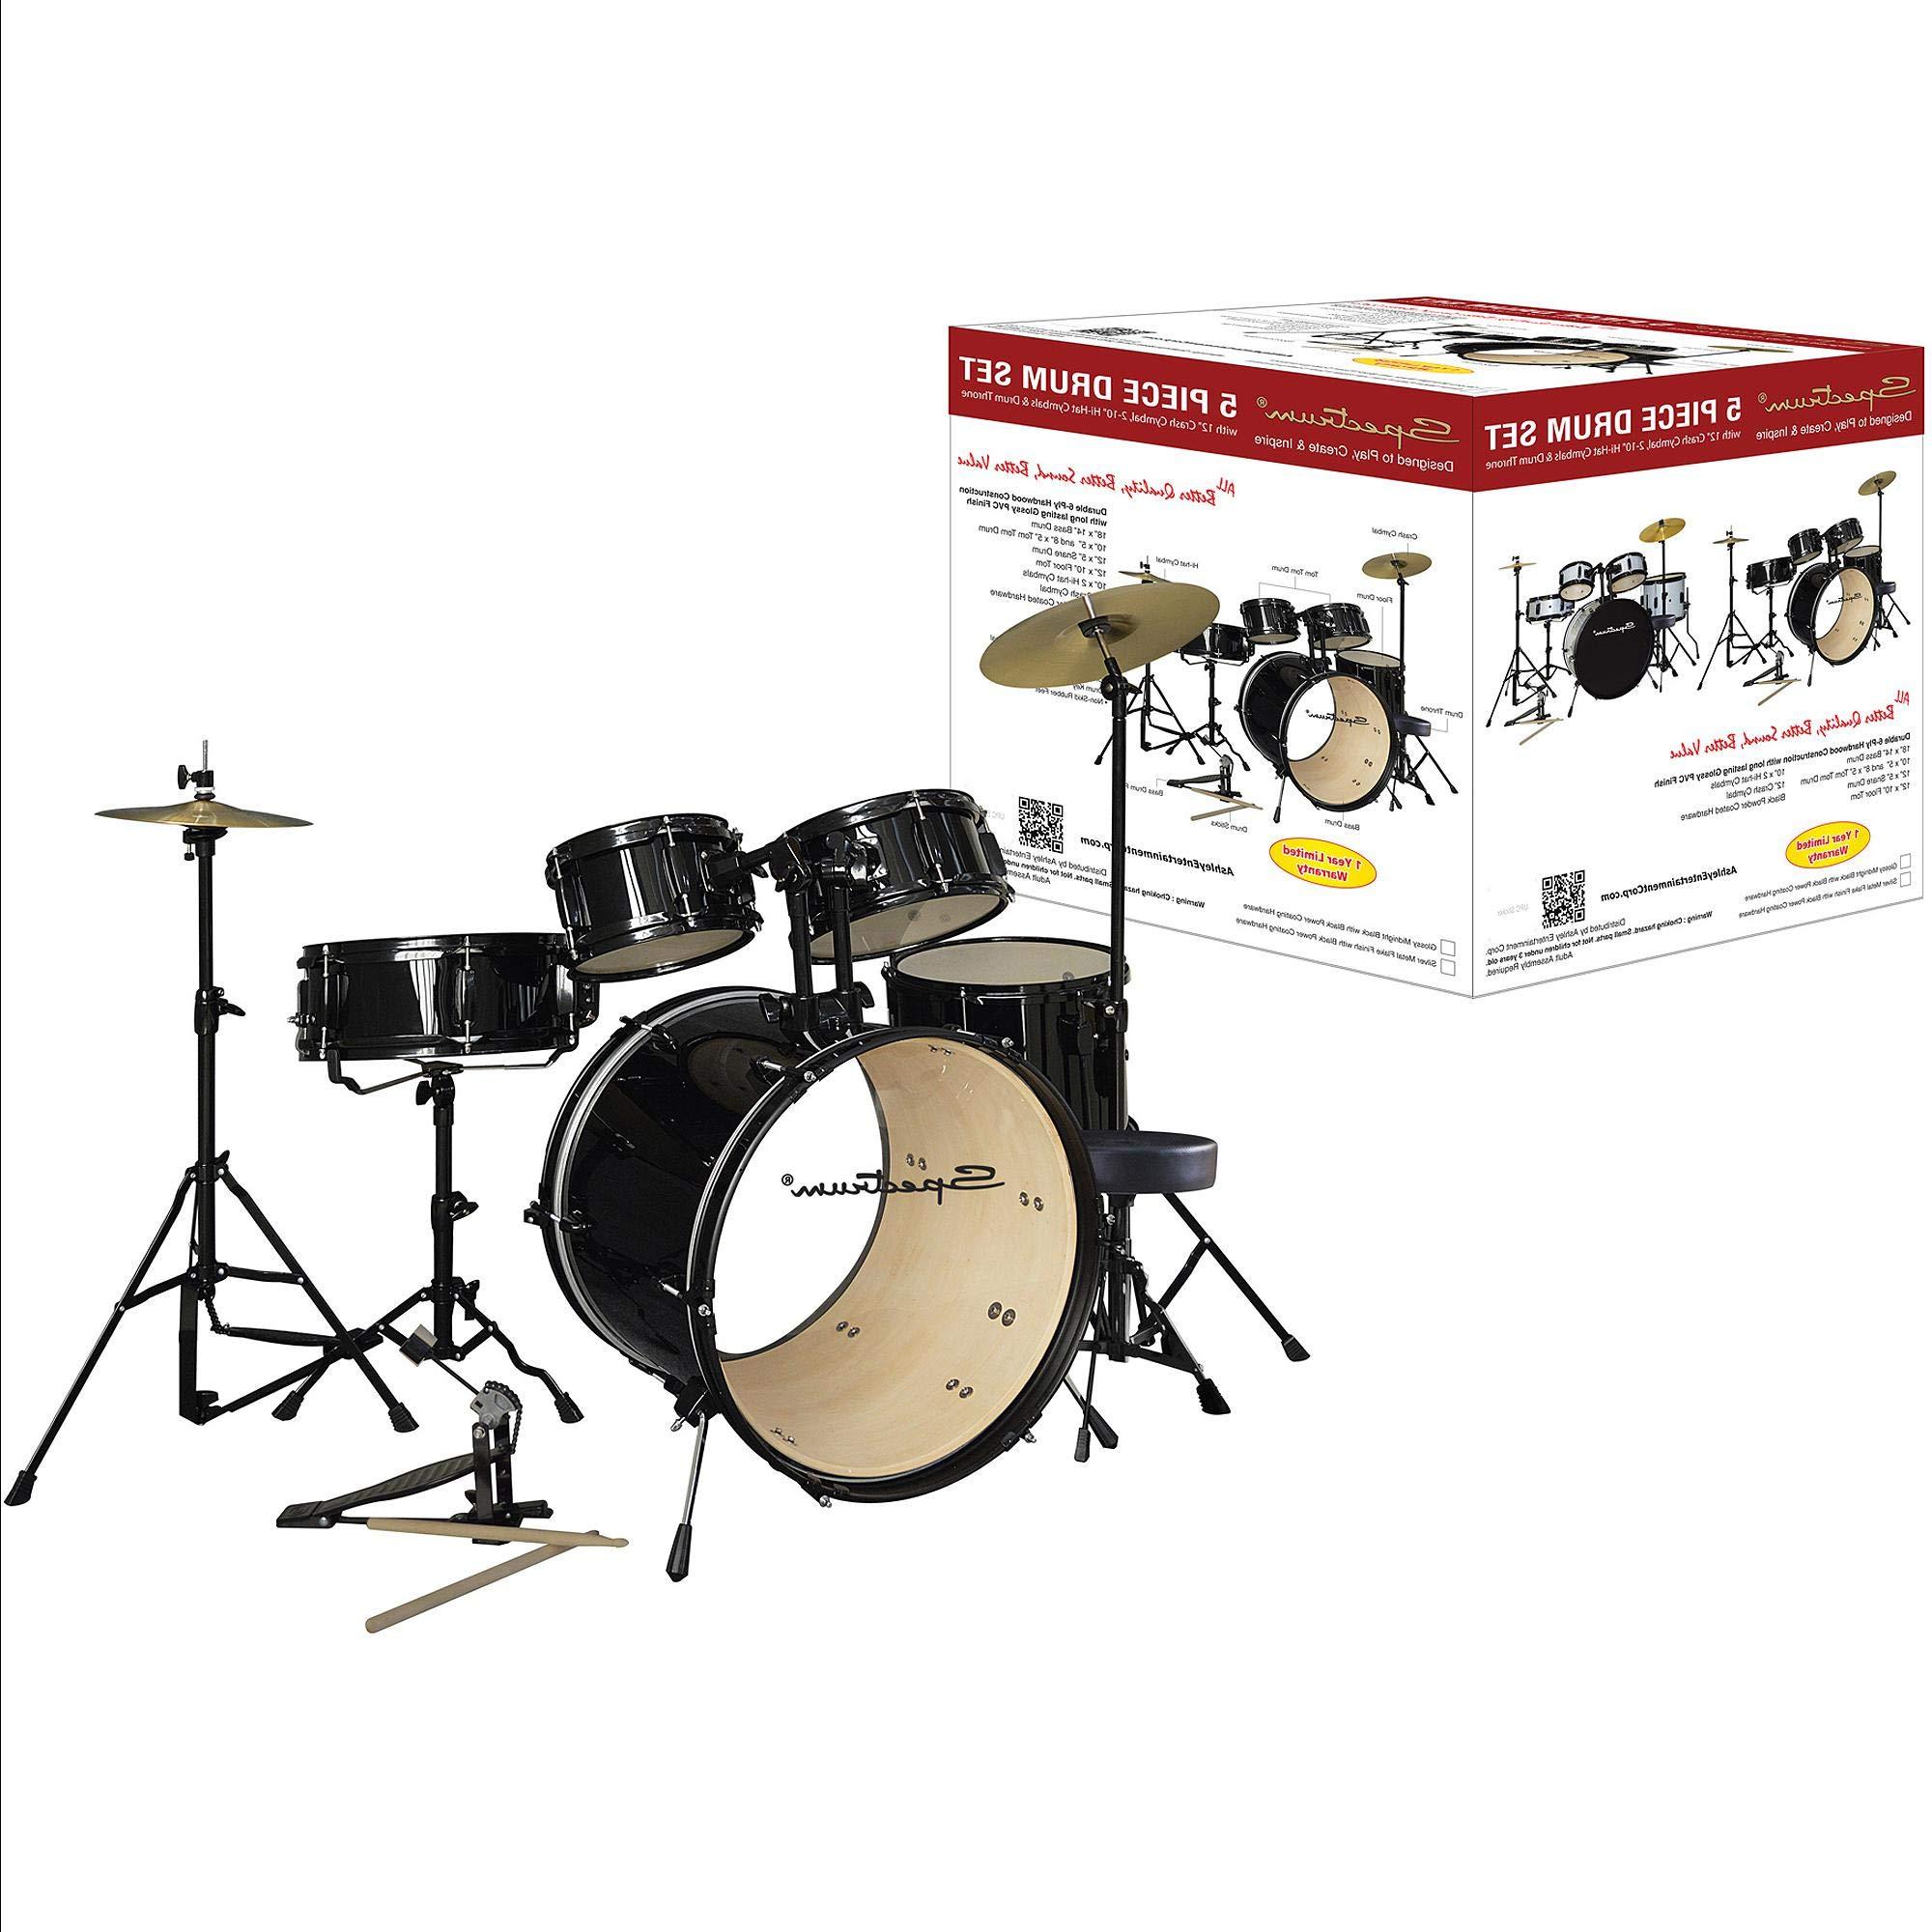 AIL 5-Piece Complete Drum Set with Bonus ound Capacity Drum Stool, Black